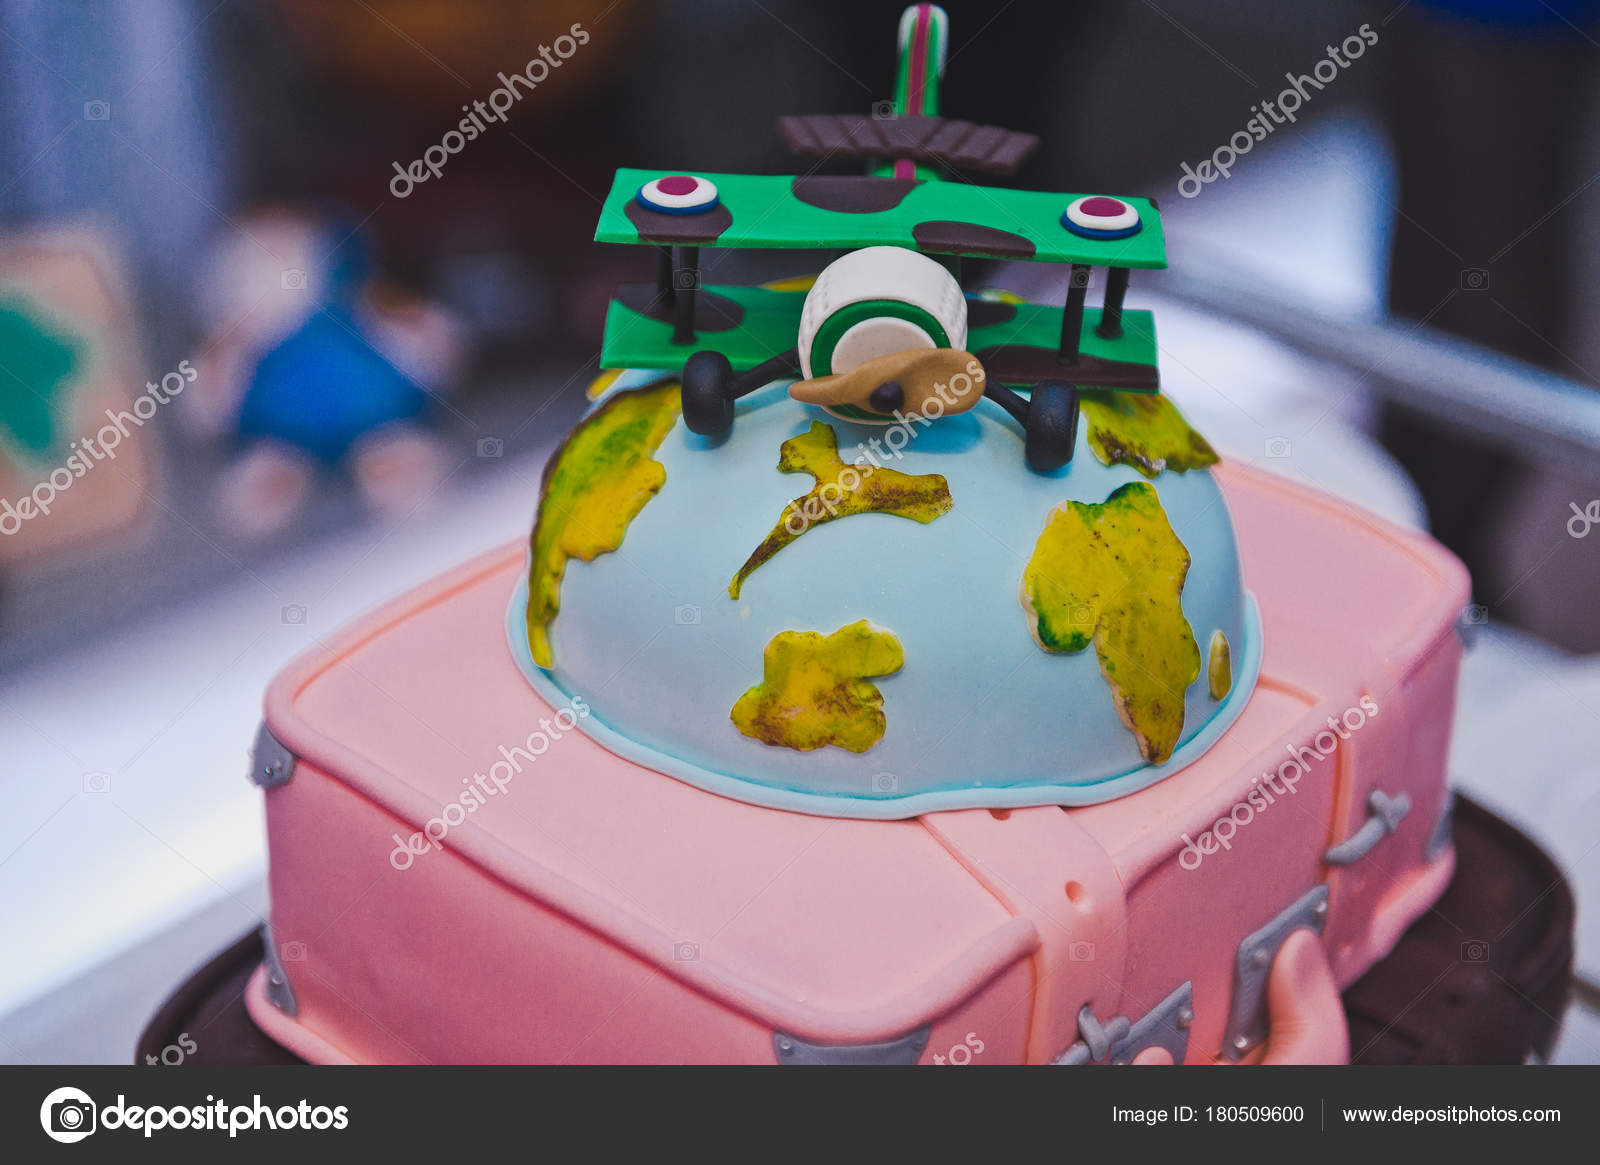 Strange Airplane Birthday Cake Designs Birthday Cake In The Design For Funny Birthday Cards Online Inifofree Goldxyz